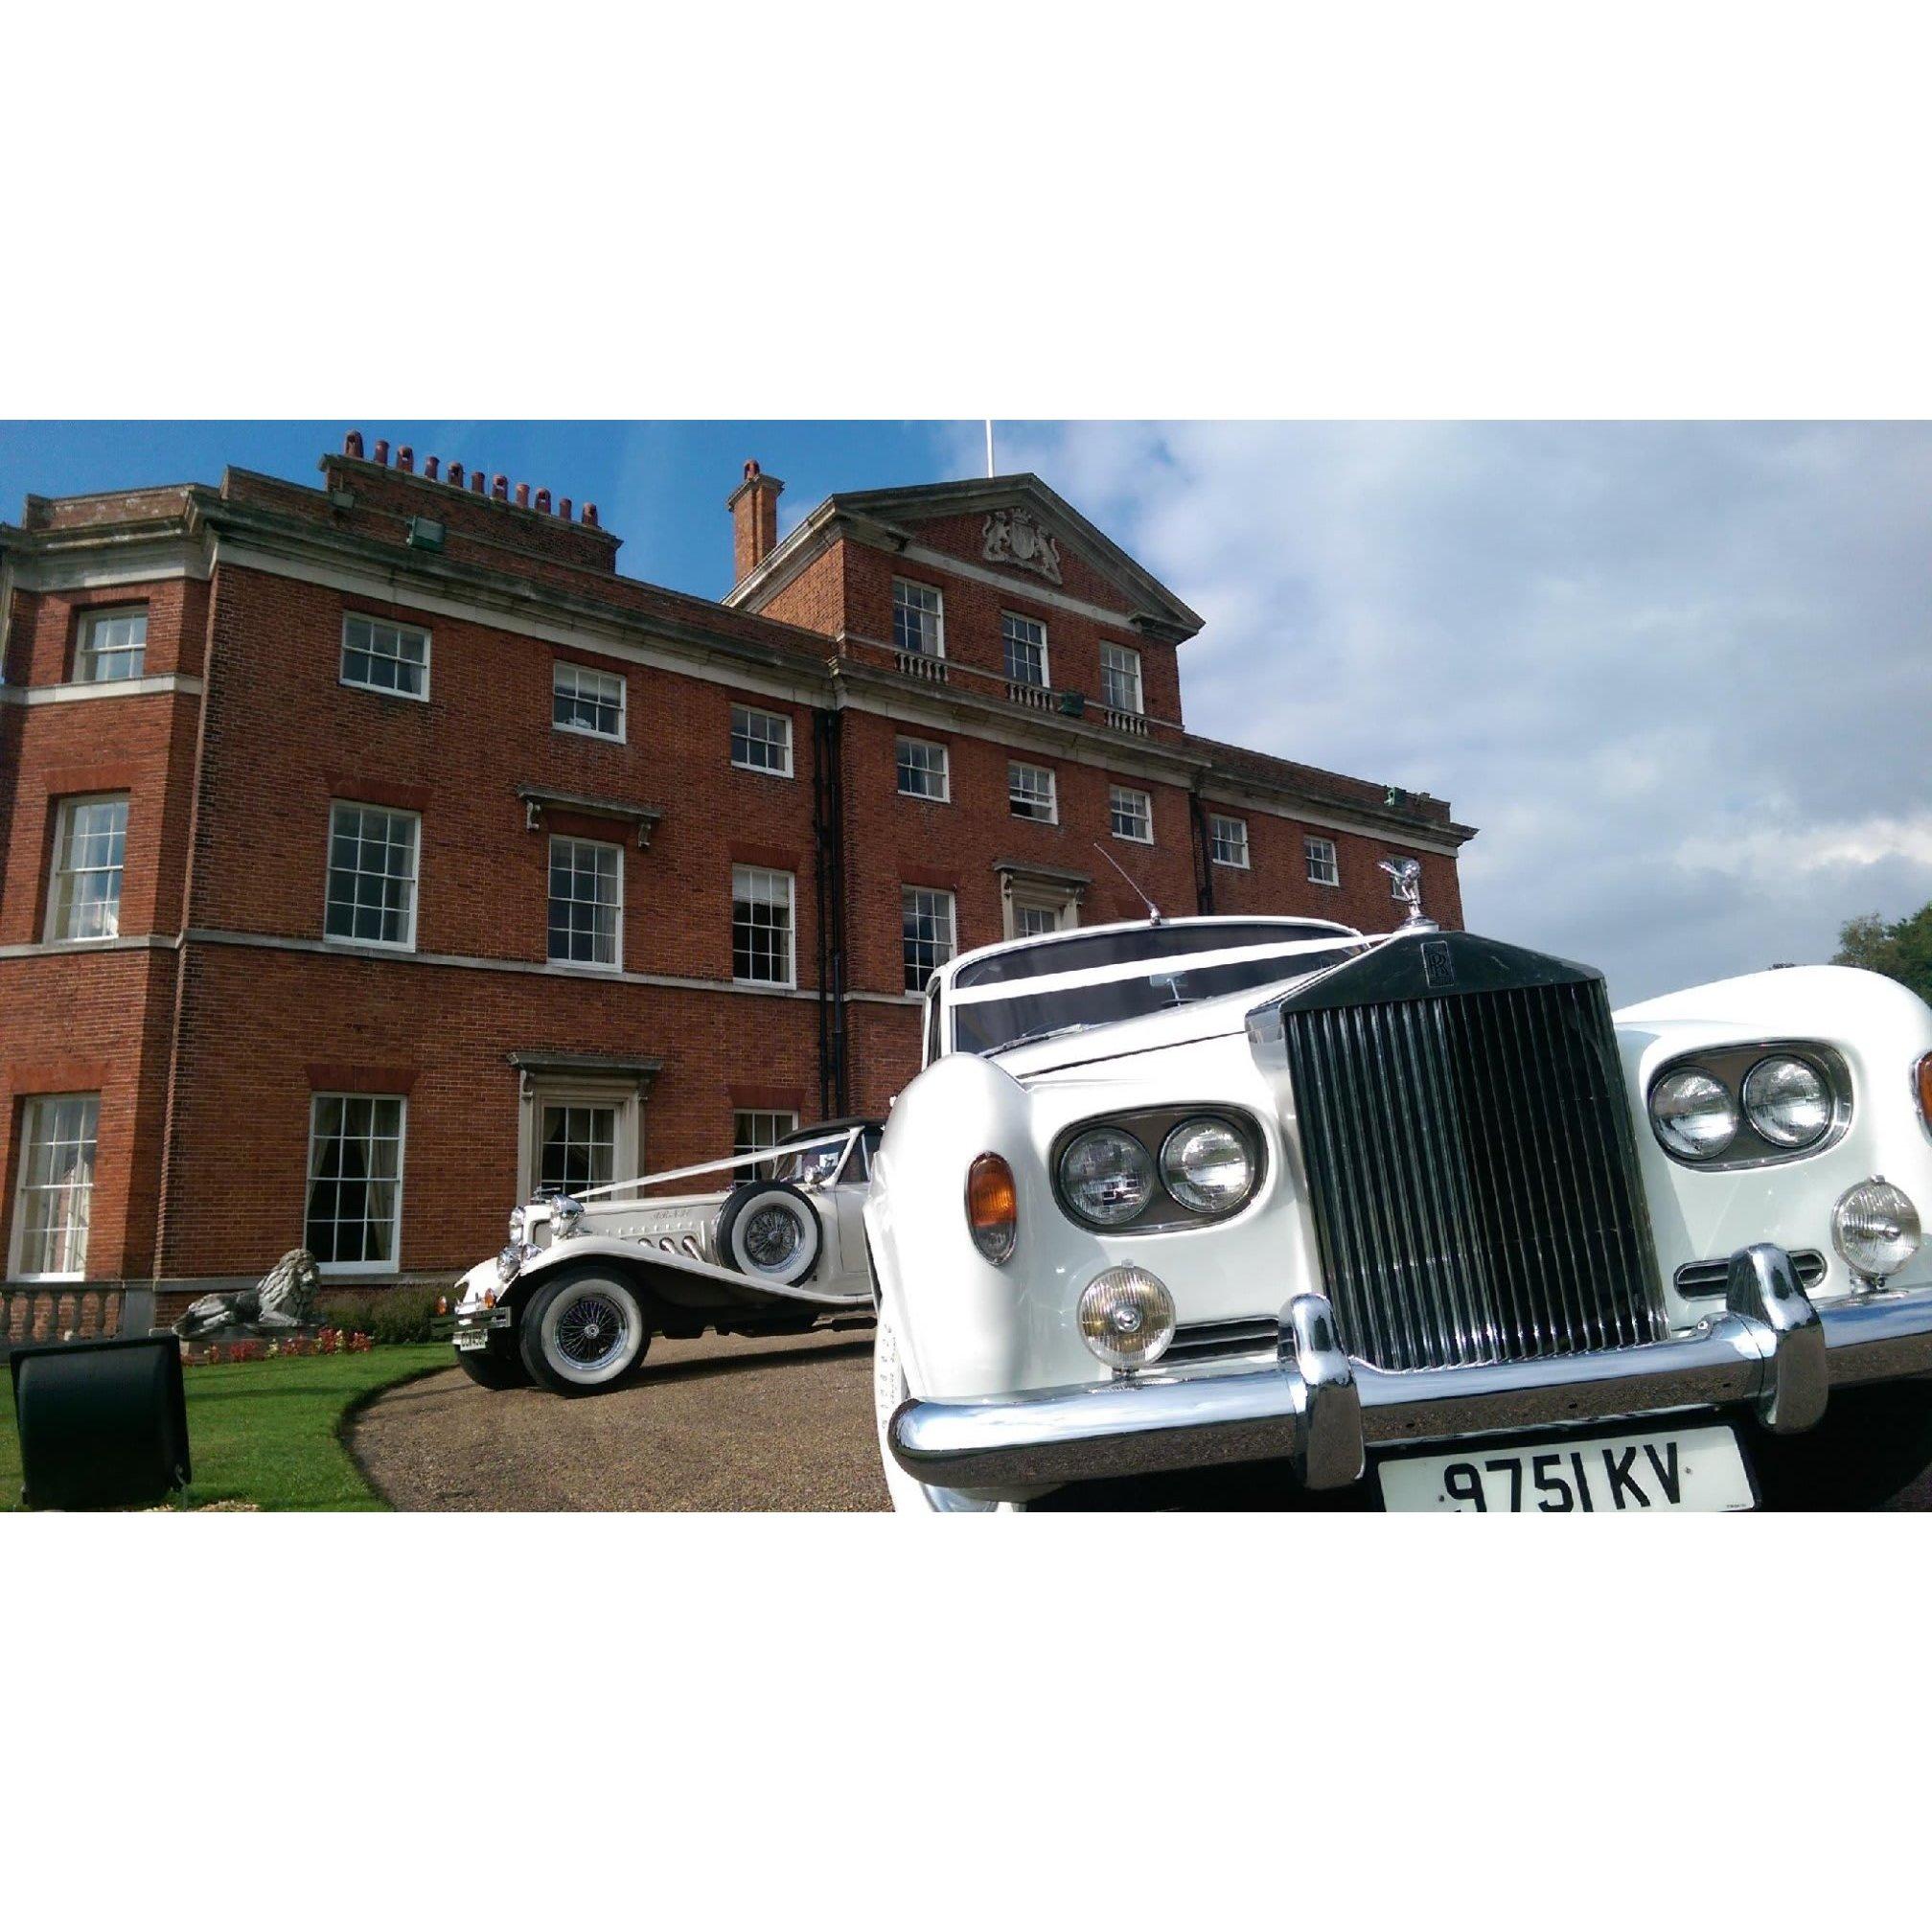 Weddings Cars of Herts - Welwyn, Hertfordshire AL6 9SH - 01438 717007 | ShowMeLocal.com